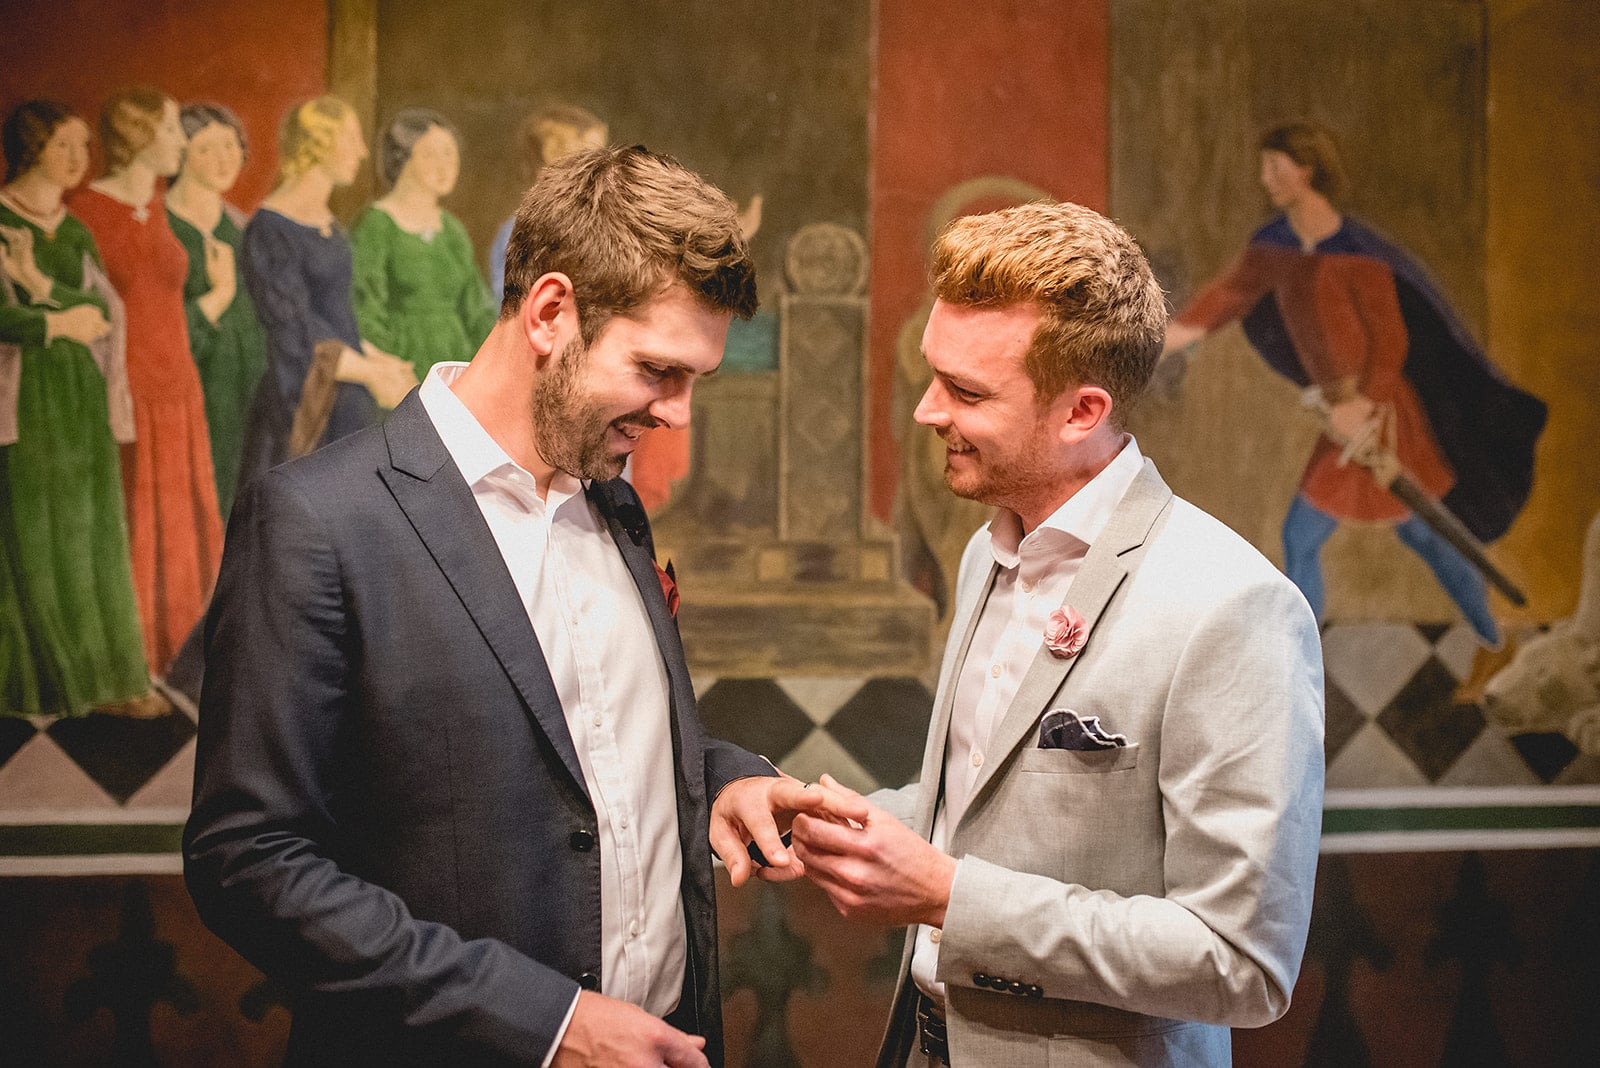 Same sex couple exchange rings at their Destination Copenhagen Elopement